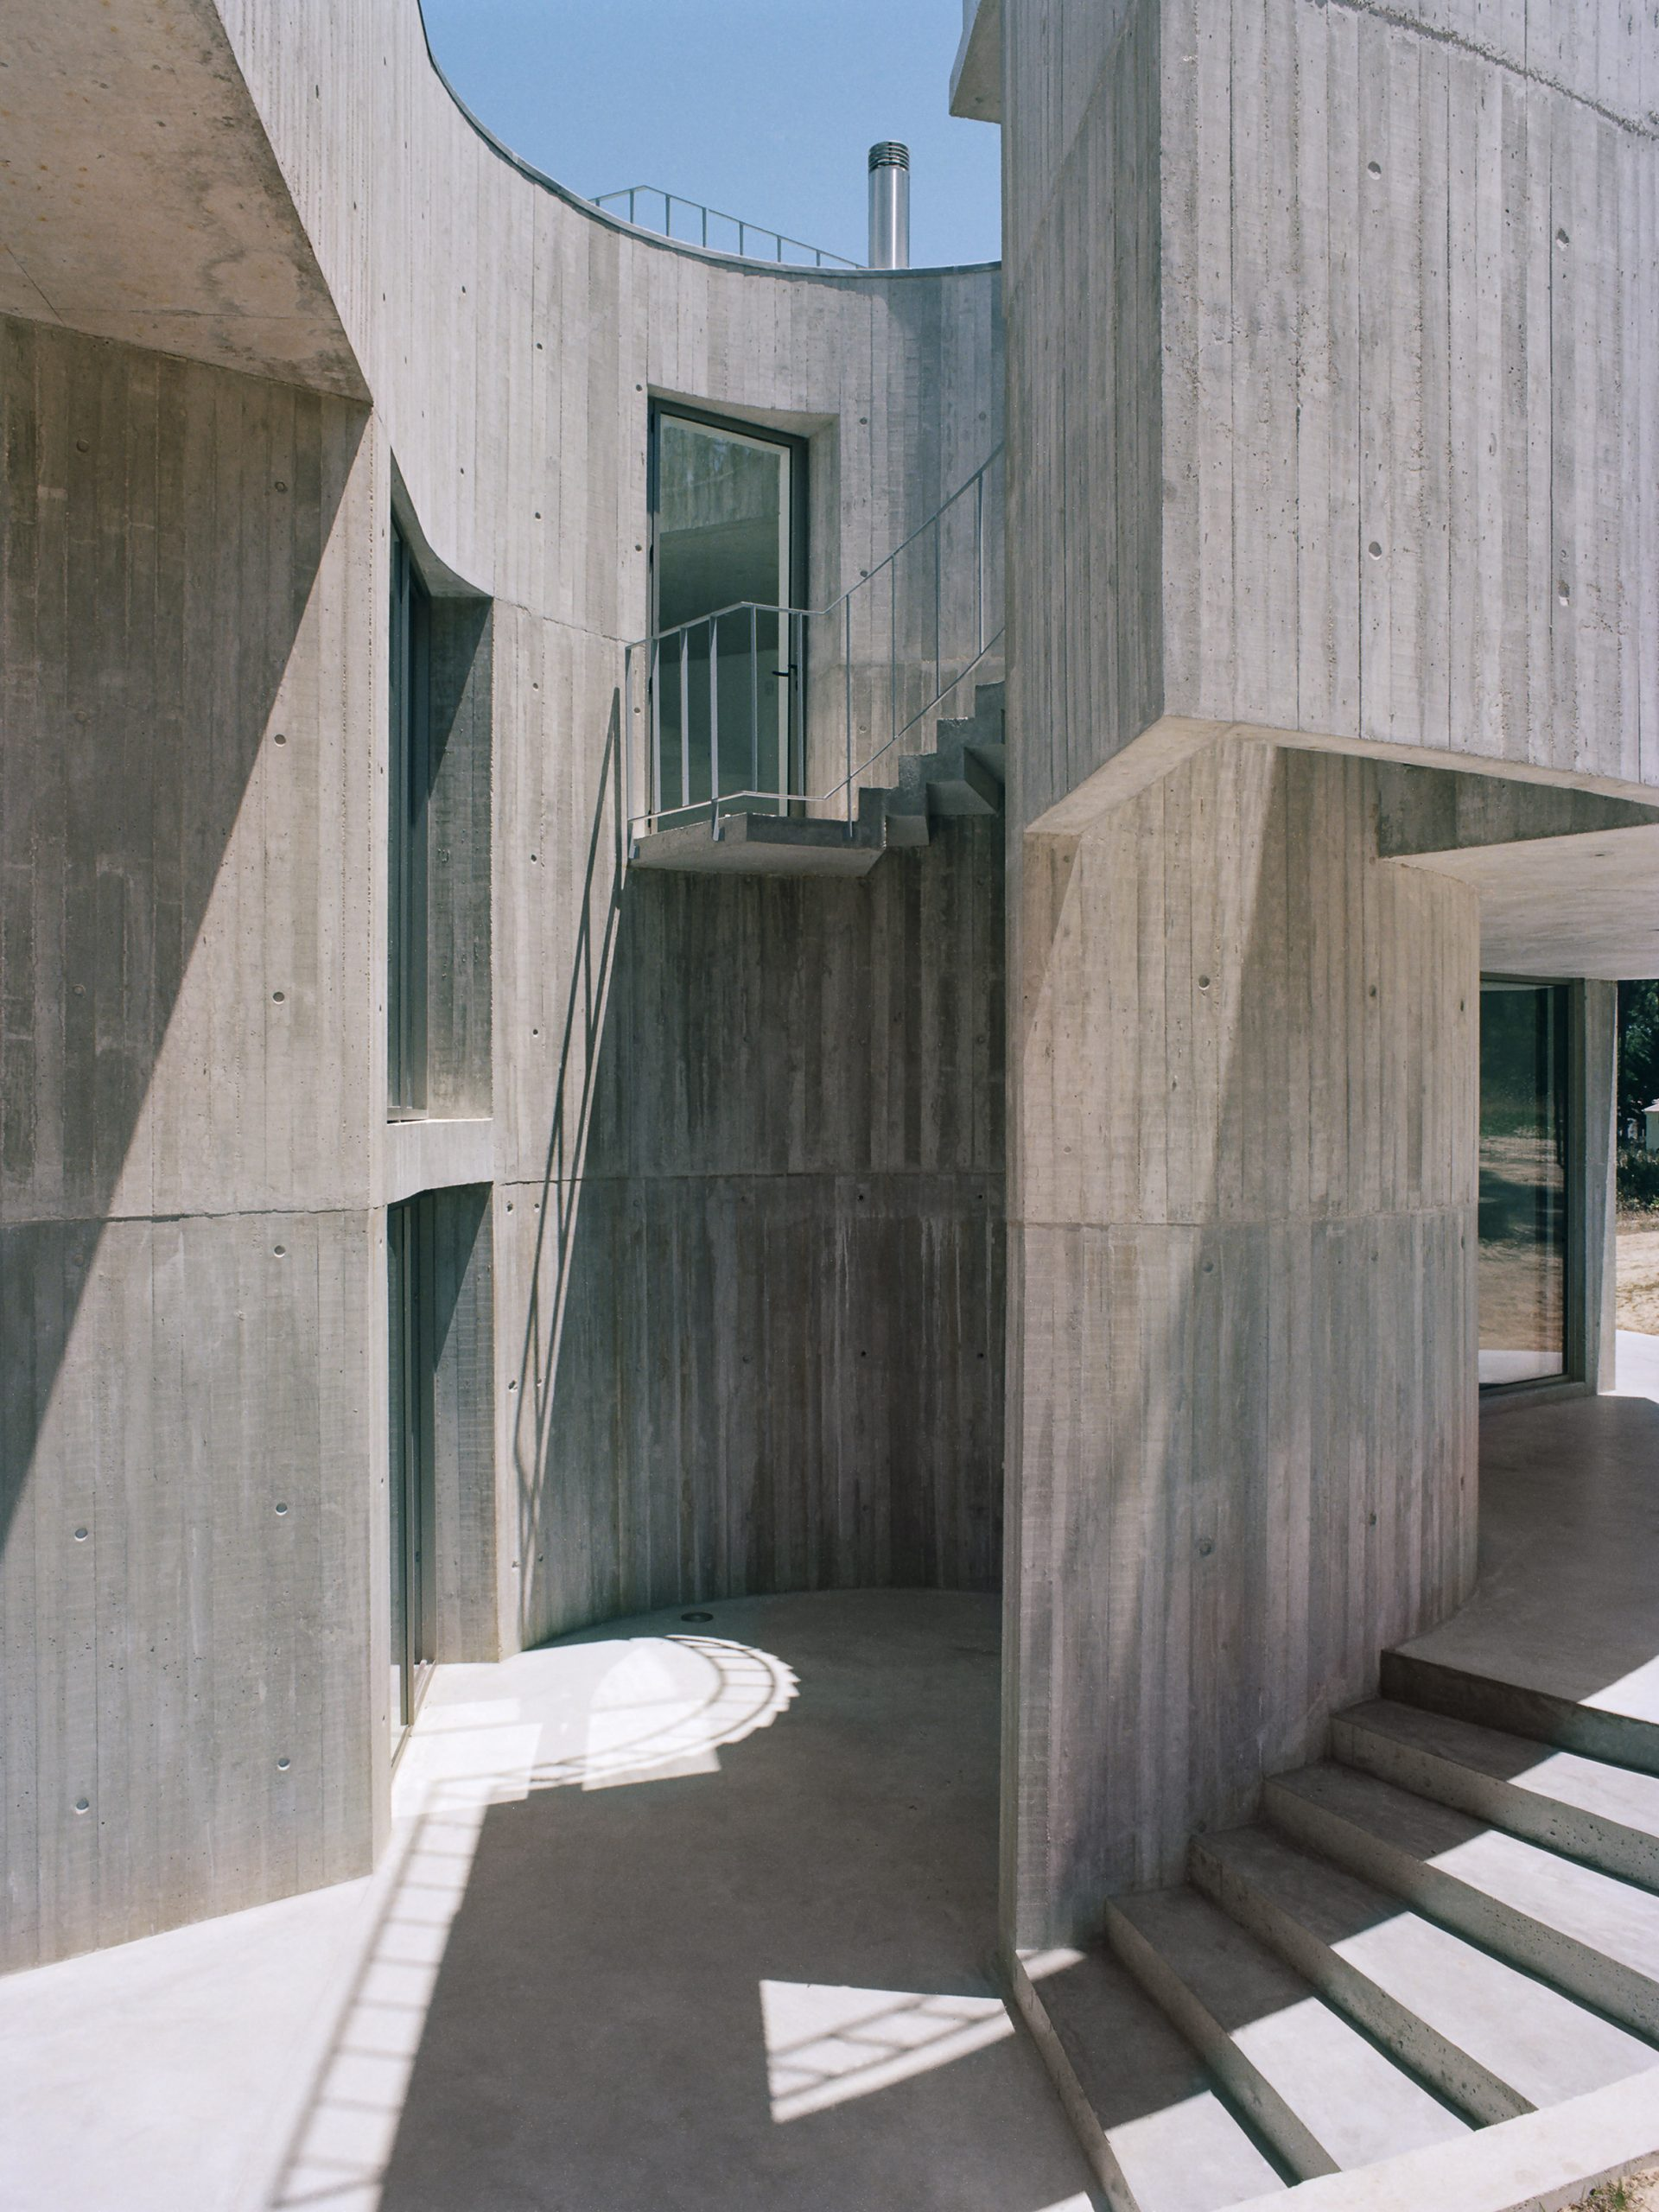 Concrete patio of Trefoil House by Double O Studio